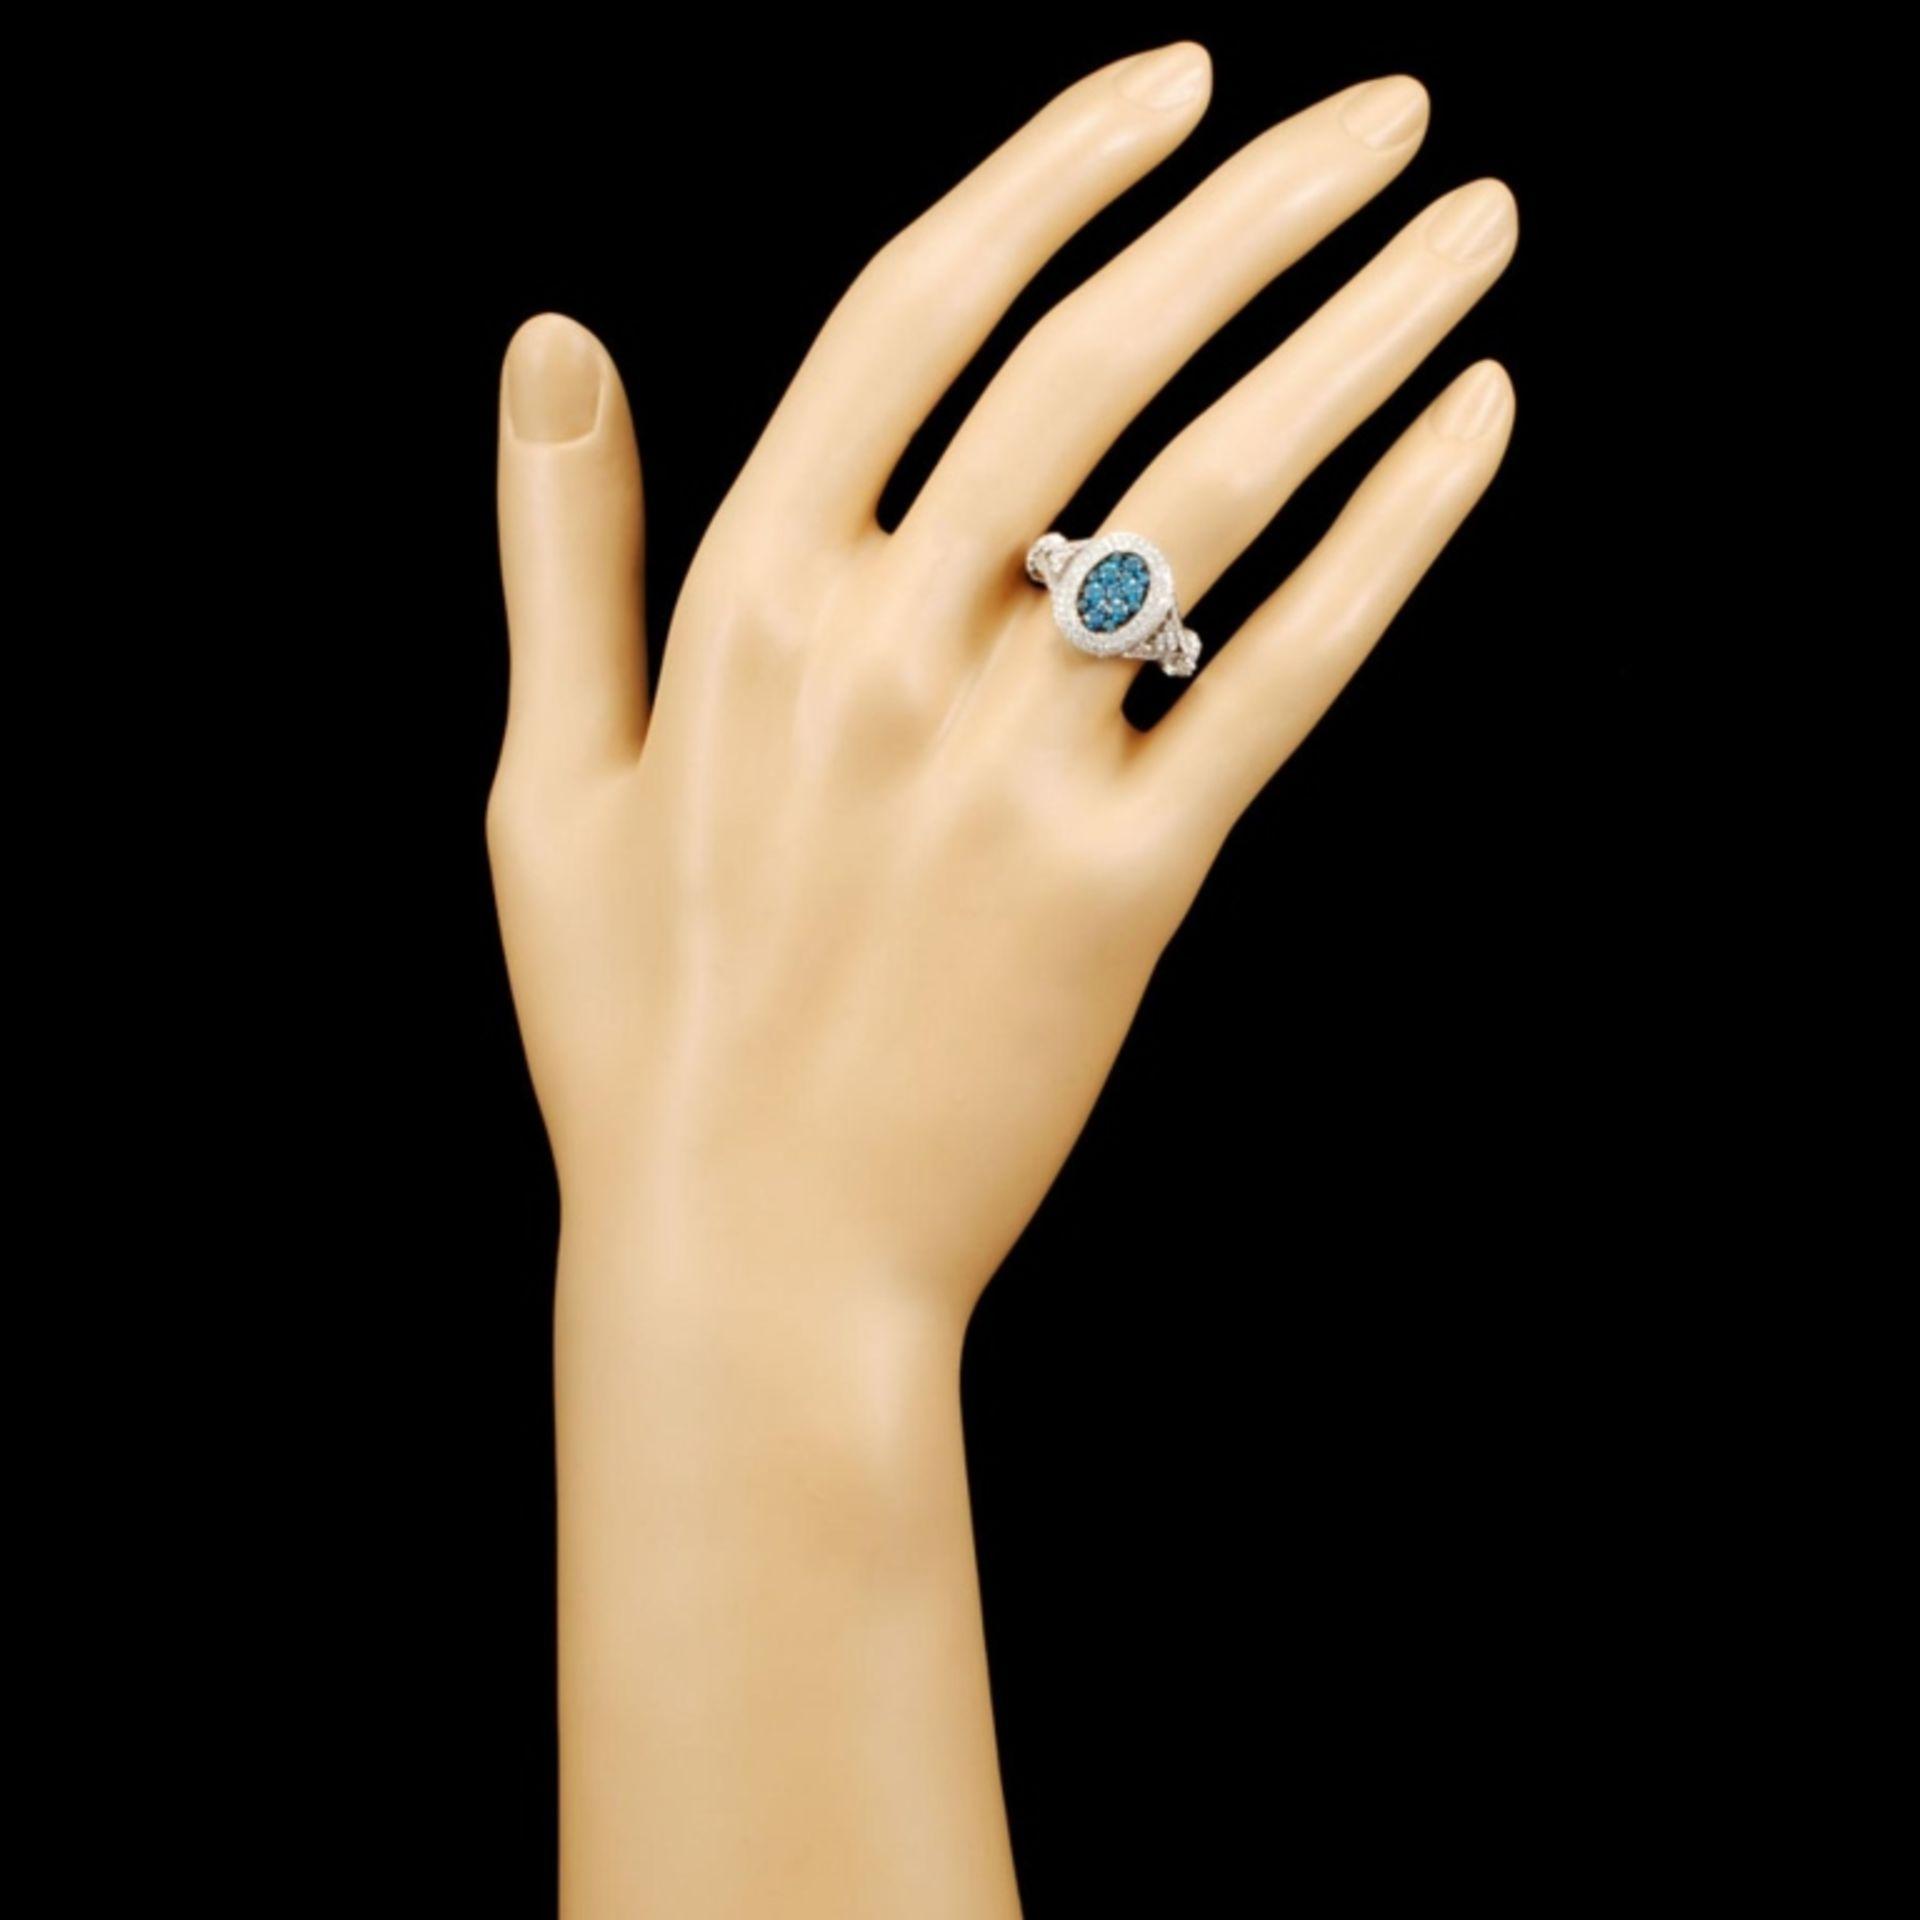 14K Gold 1.20ctw Diamond Ring - Image 4 of 5